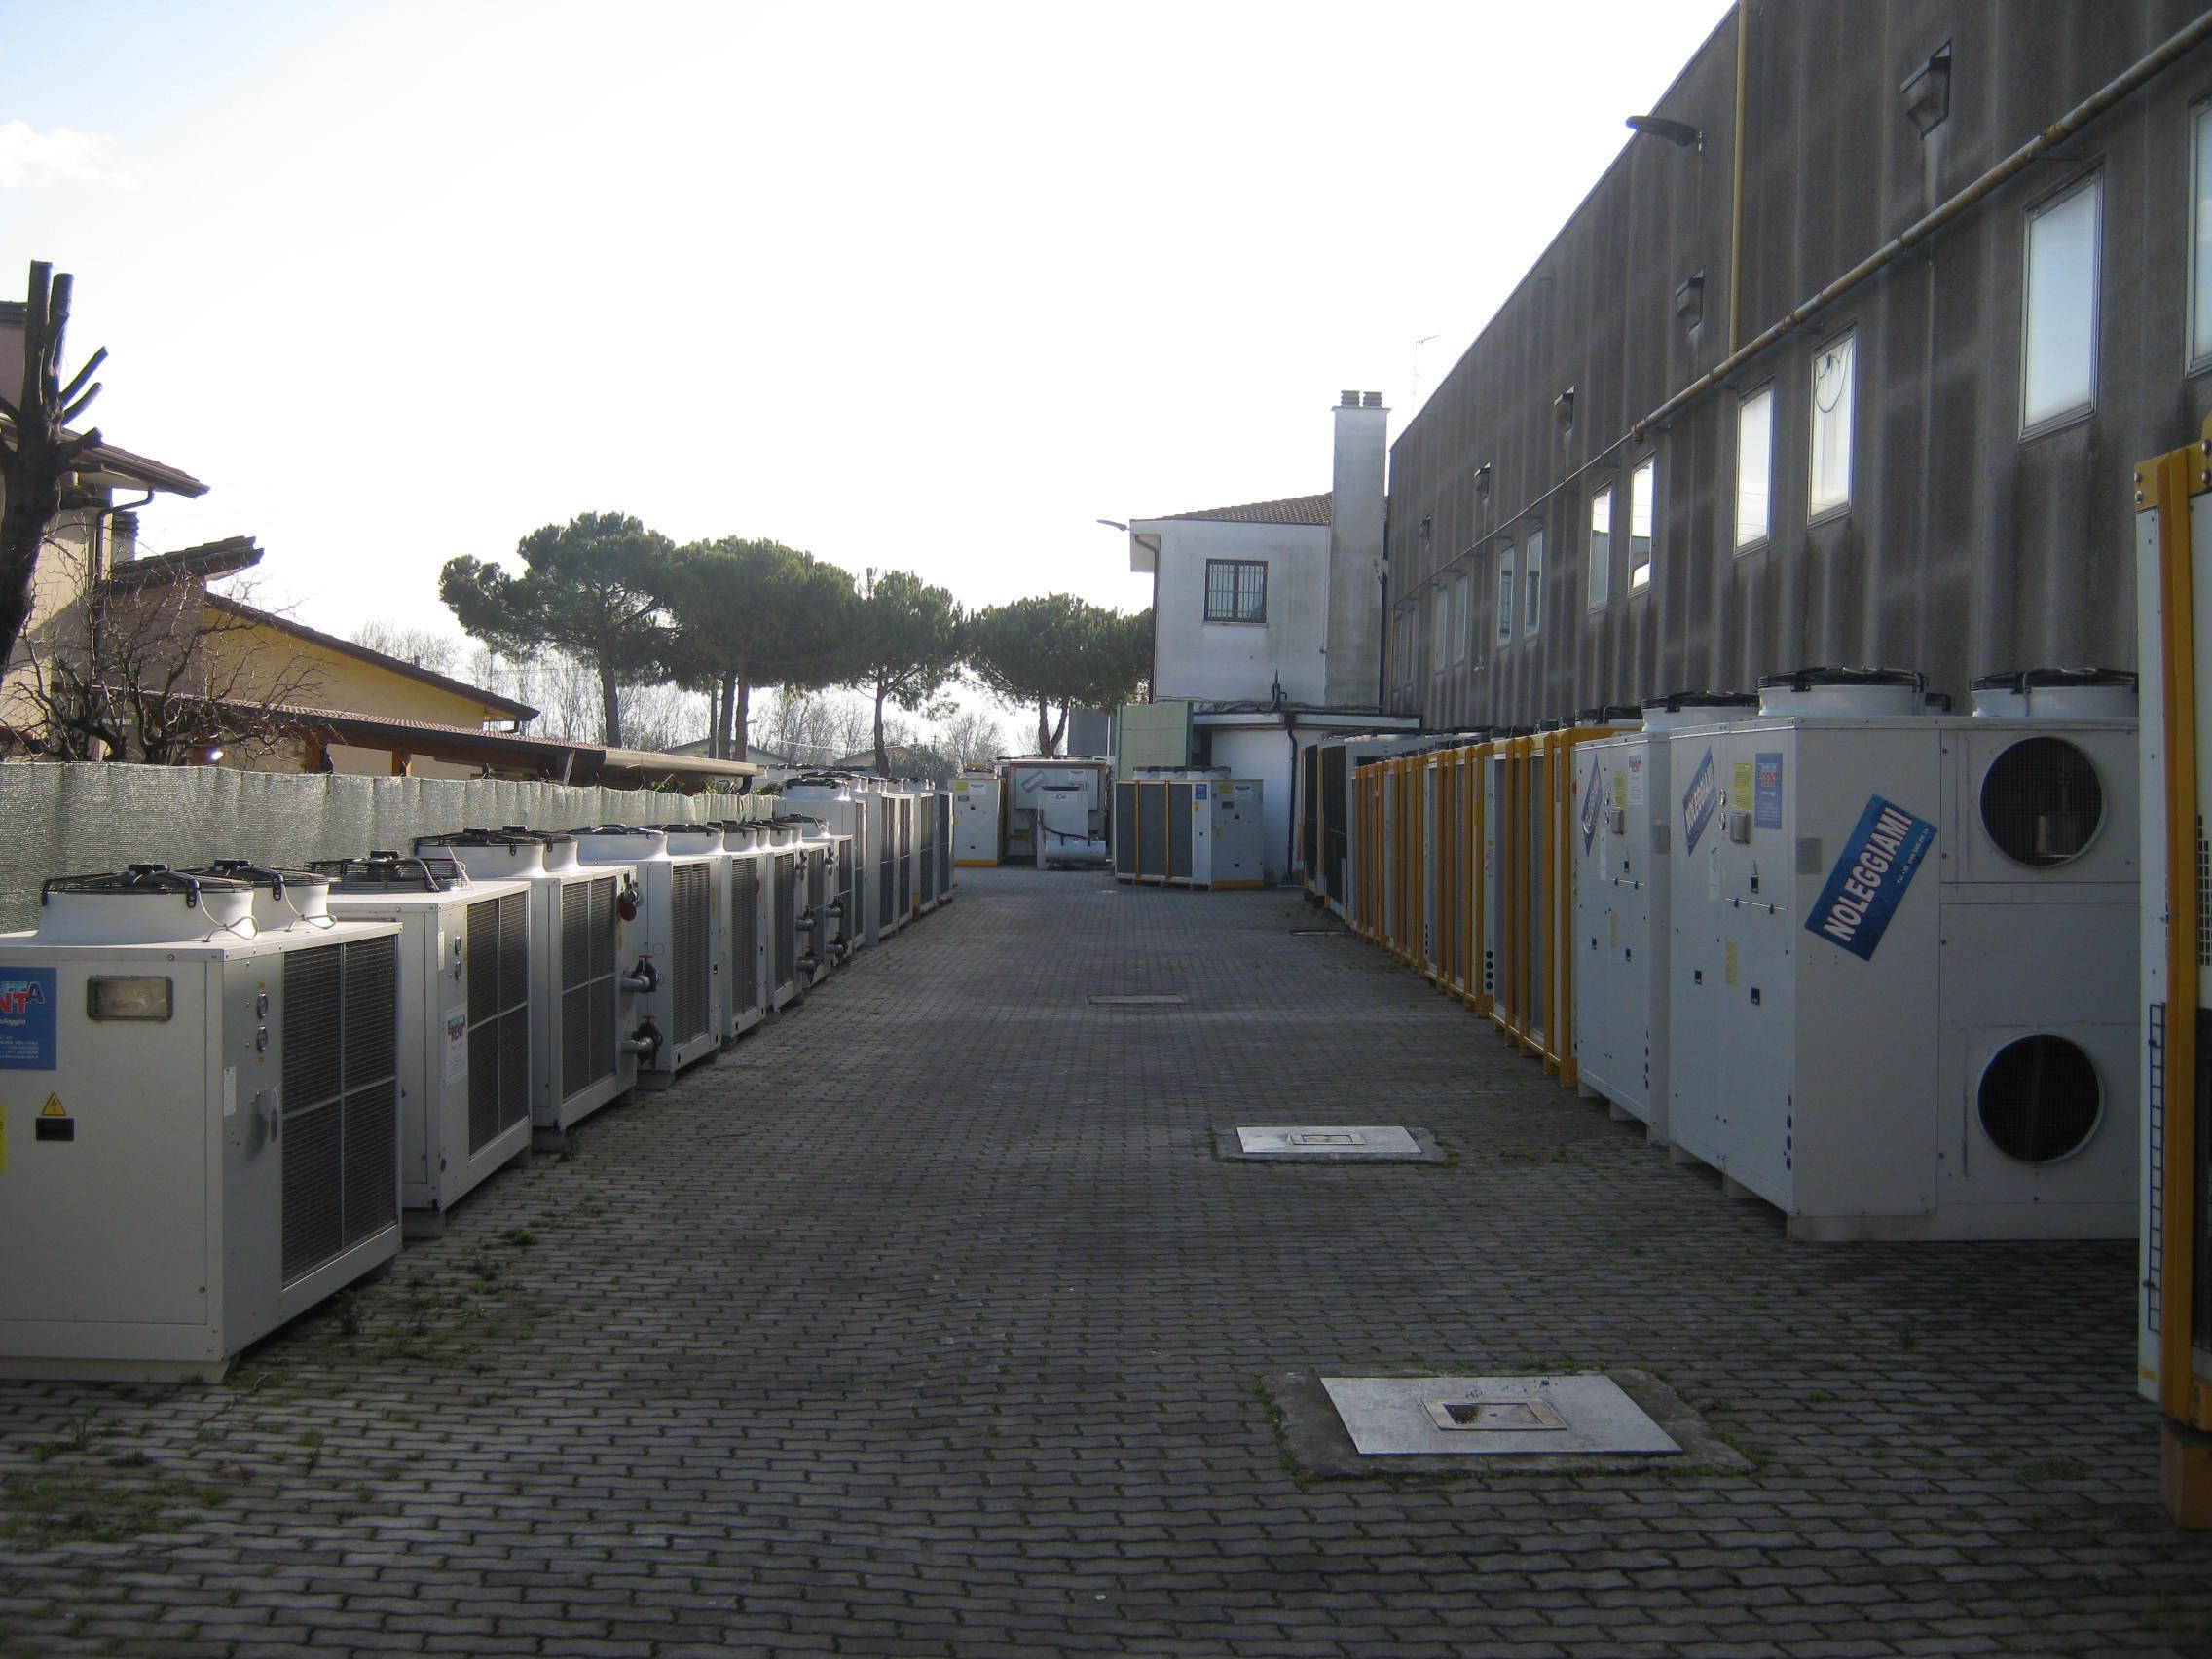 Brenta Rent - Parco Macchine (2)